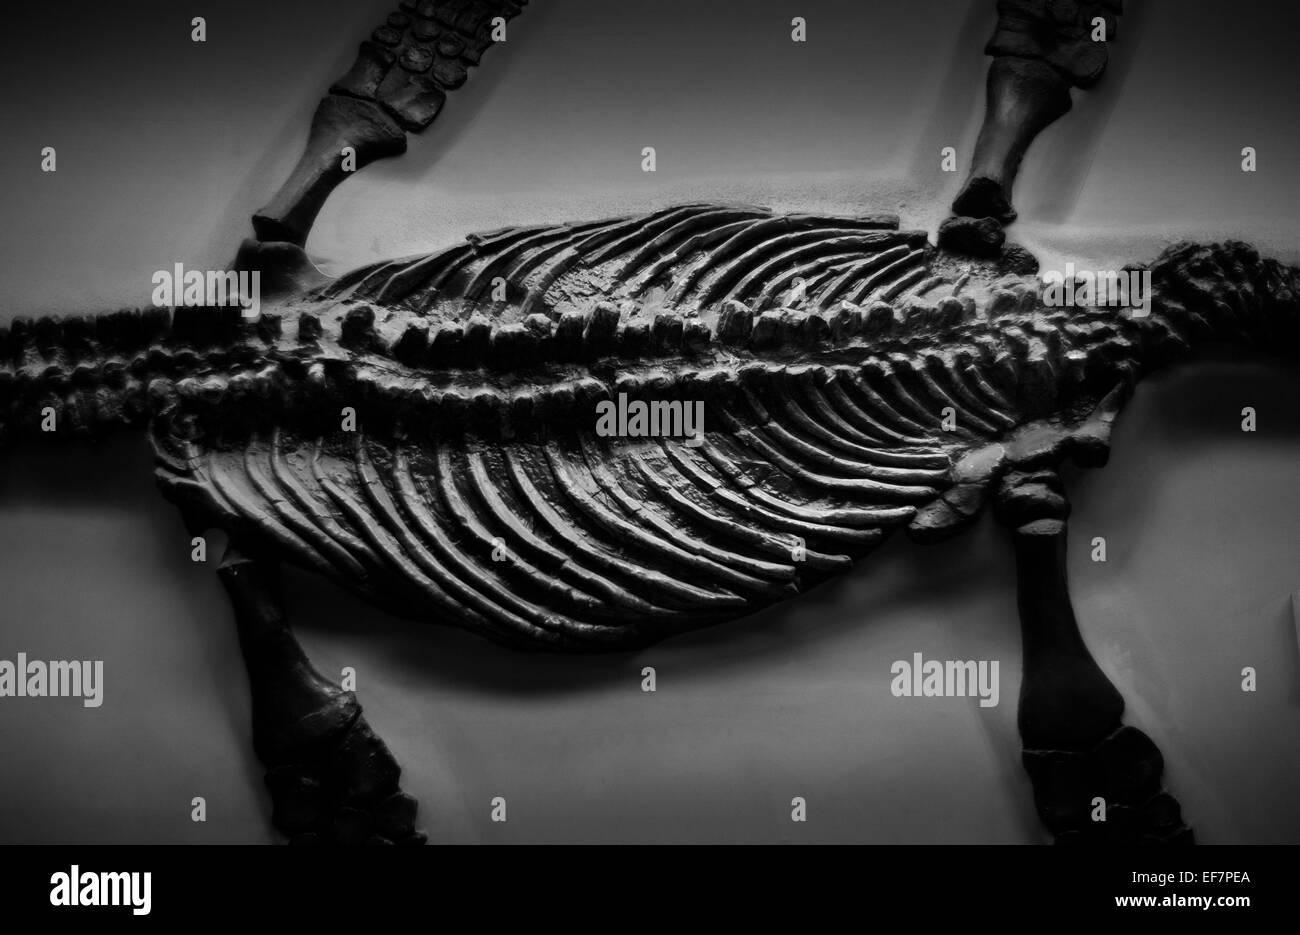 Natural History Museum, London, England,UK. January 2015 Pliosaur, Rhomaleosaurus Cramptoni - Stock Image